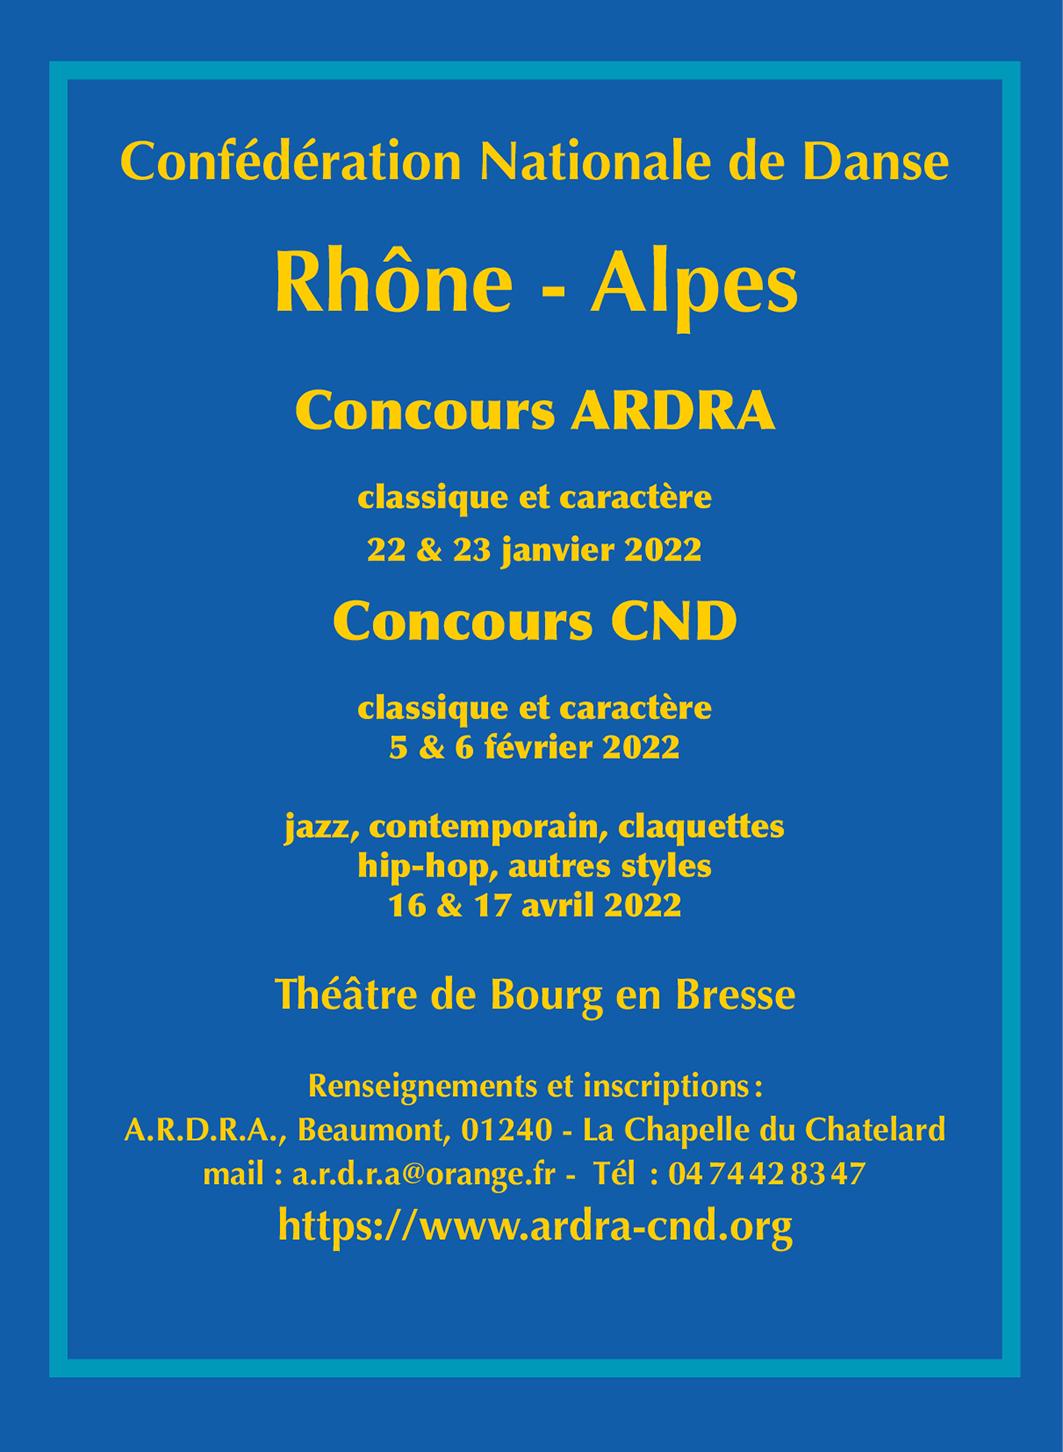 Concours 2022 CND RHÔNE-ALPES